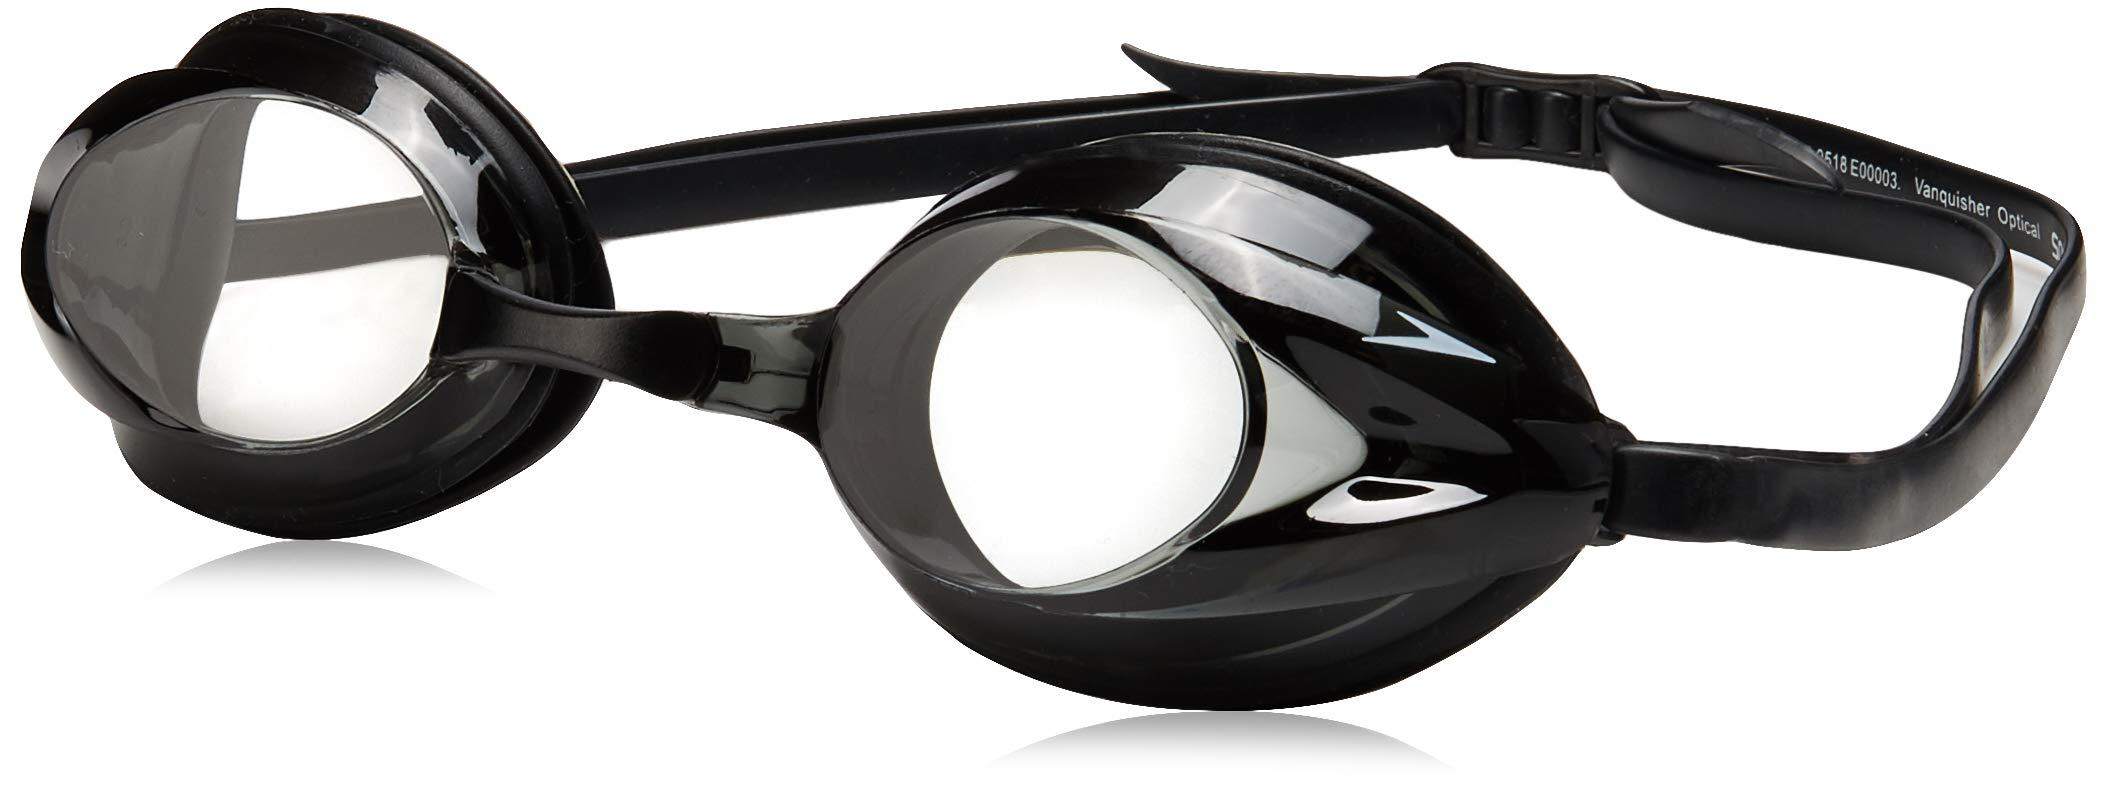 Speedo Vanquisher Optical Swim Goggle, Clear, -1.5